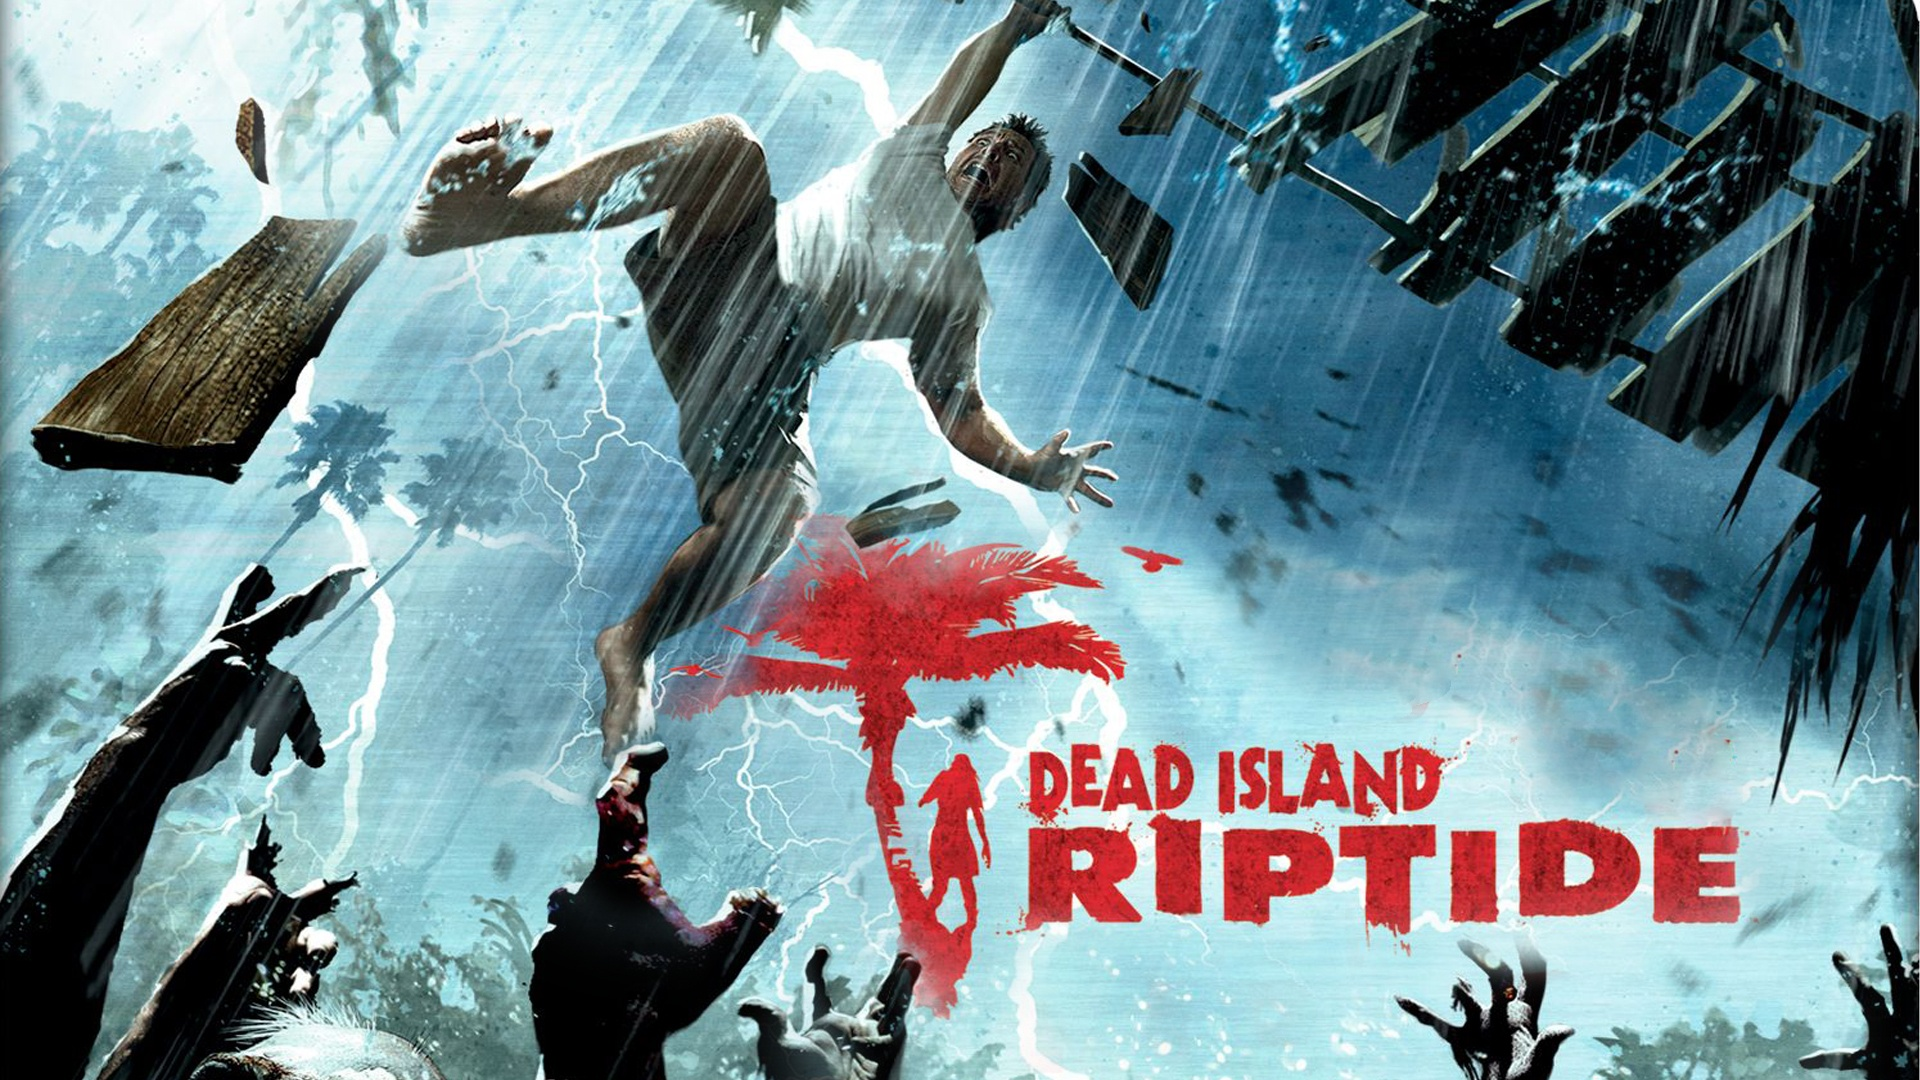 7009018 dead island riptide